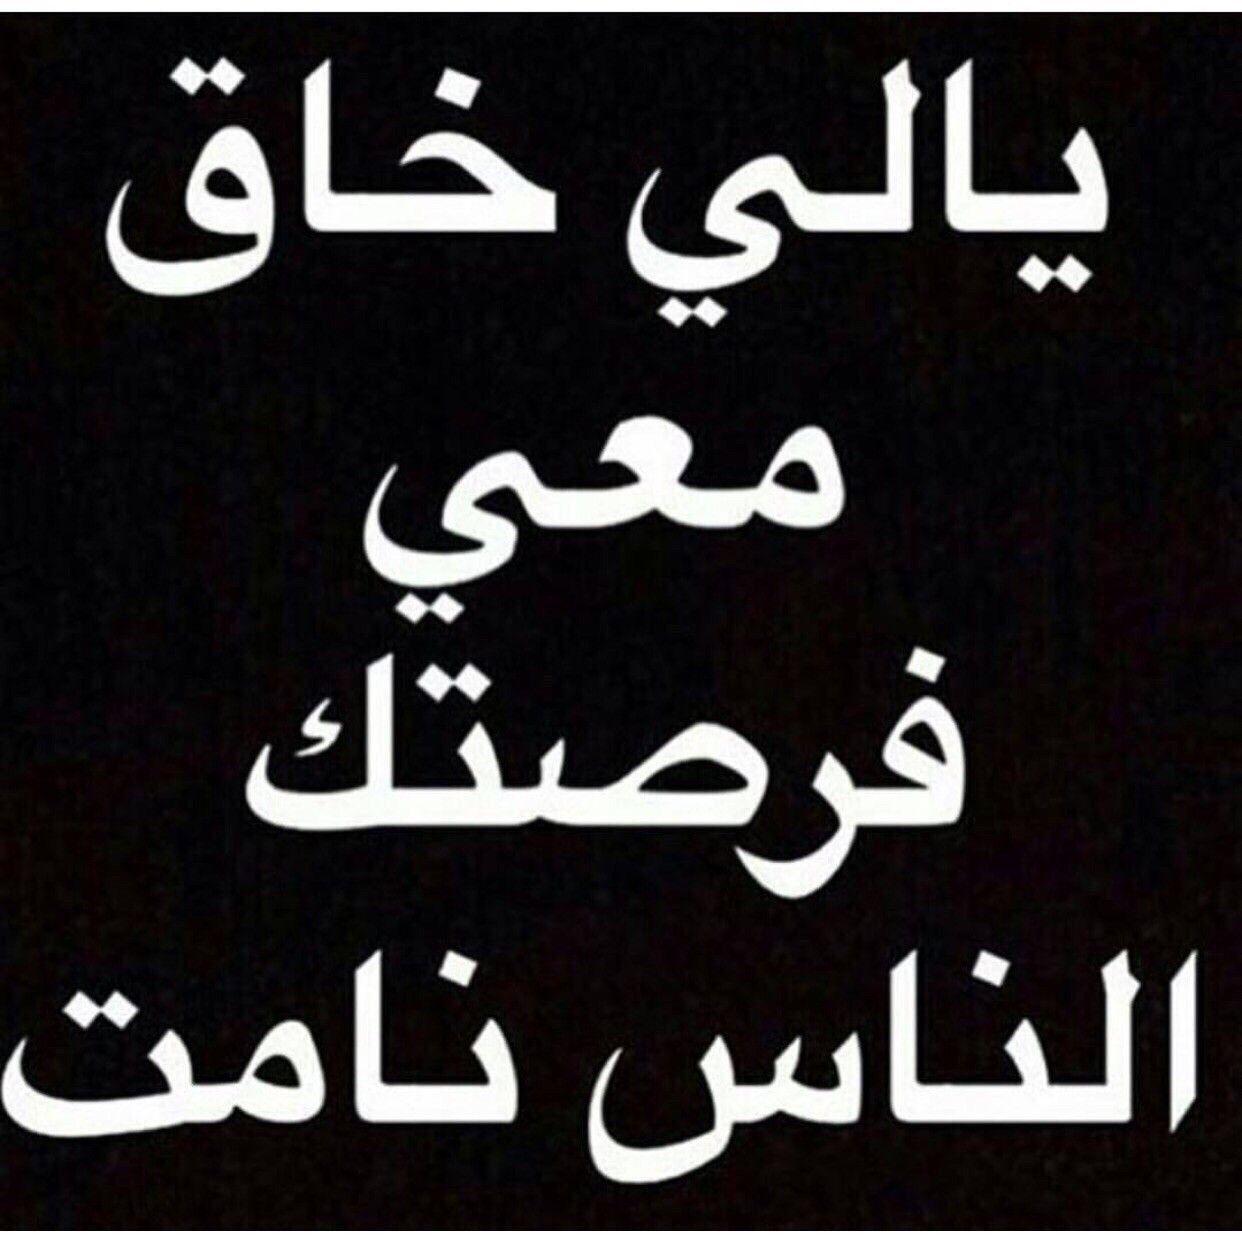 يالي خاق Funny Arabic Calligraphy Calligraphy